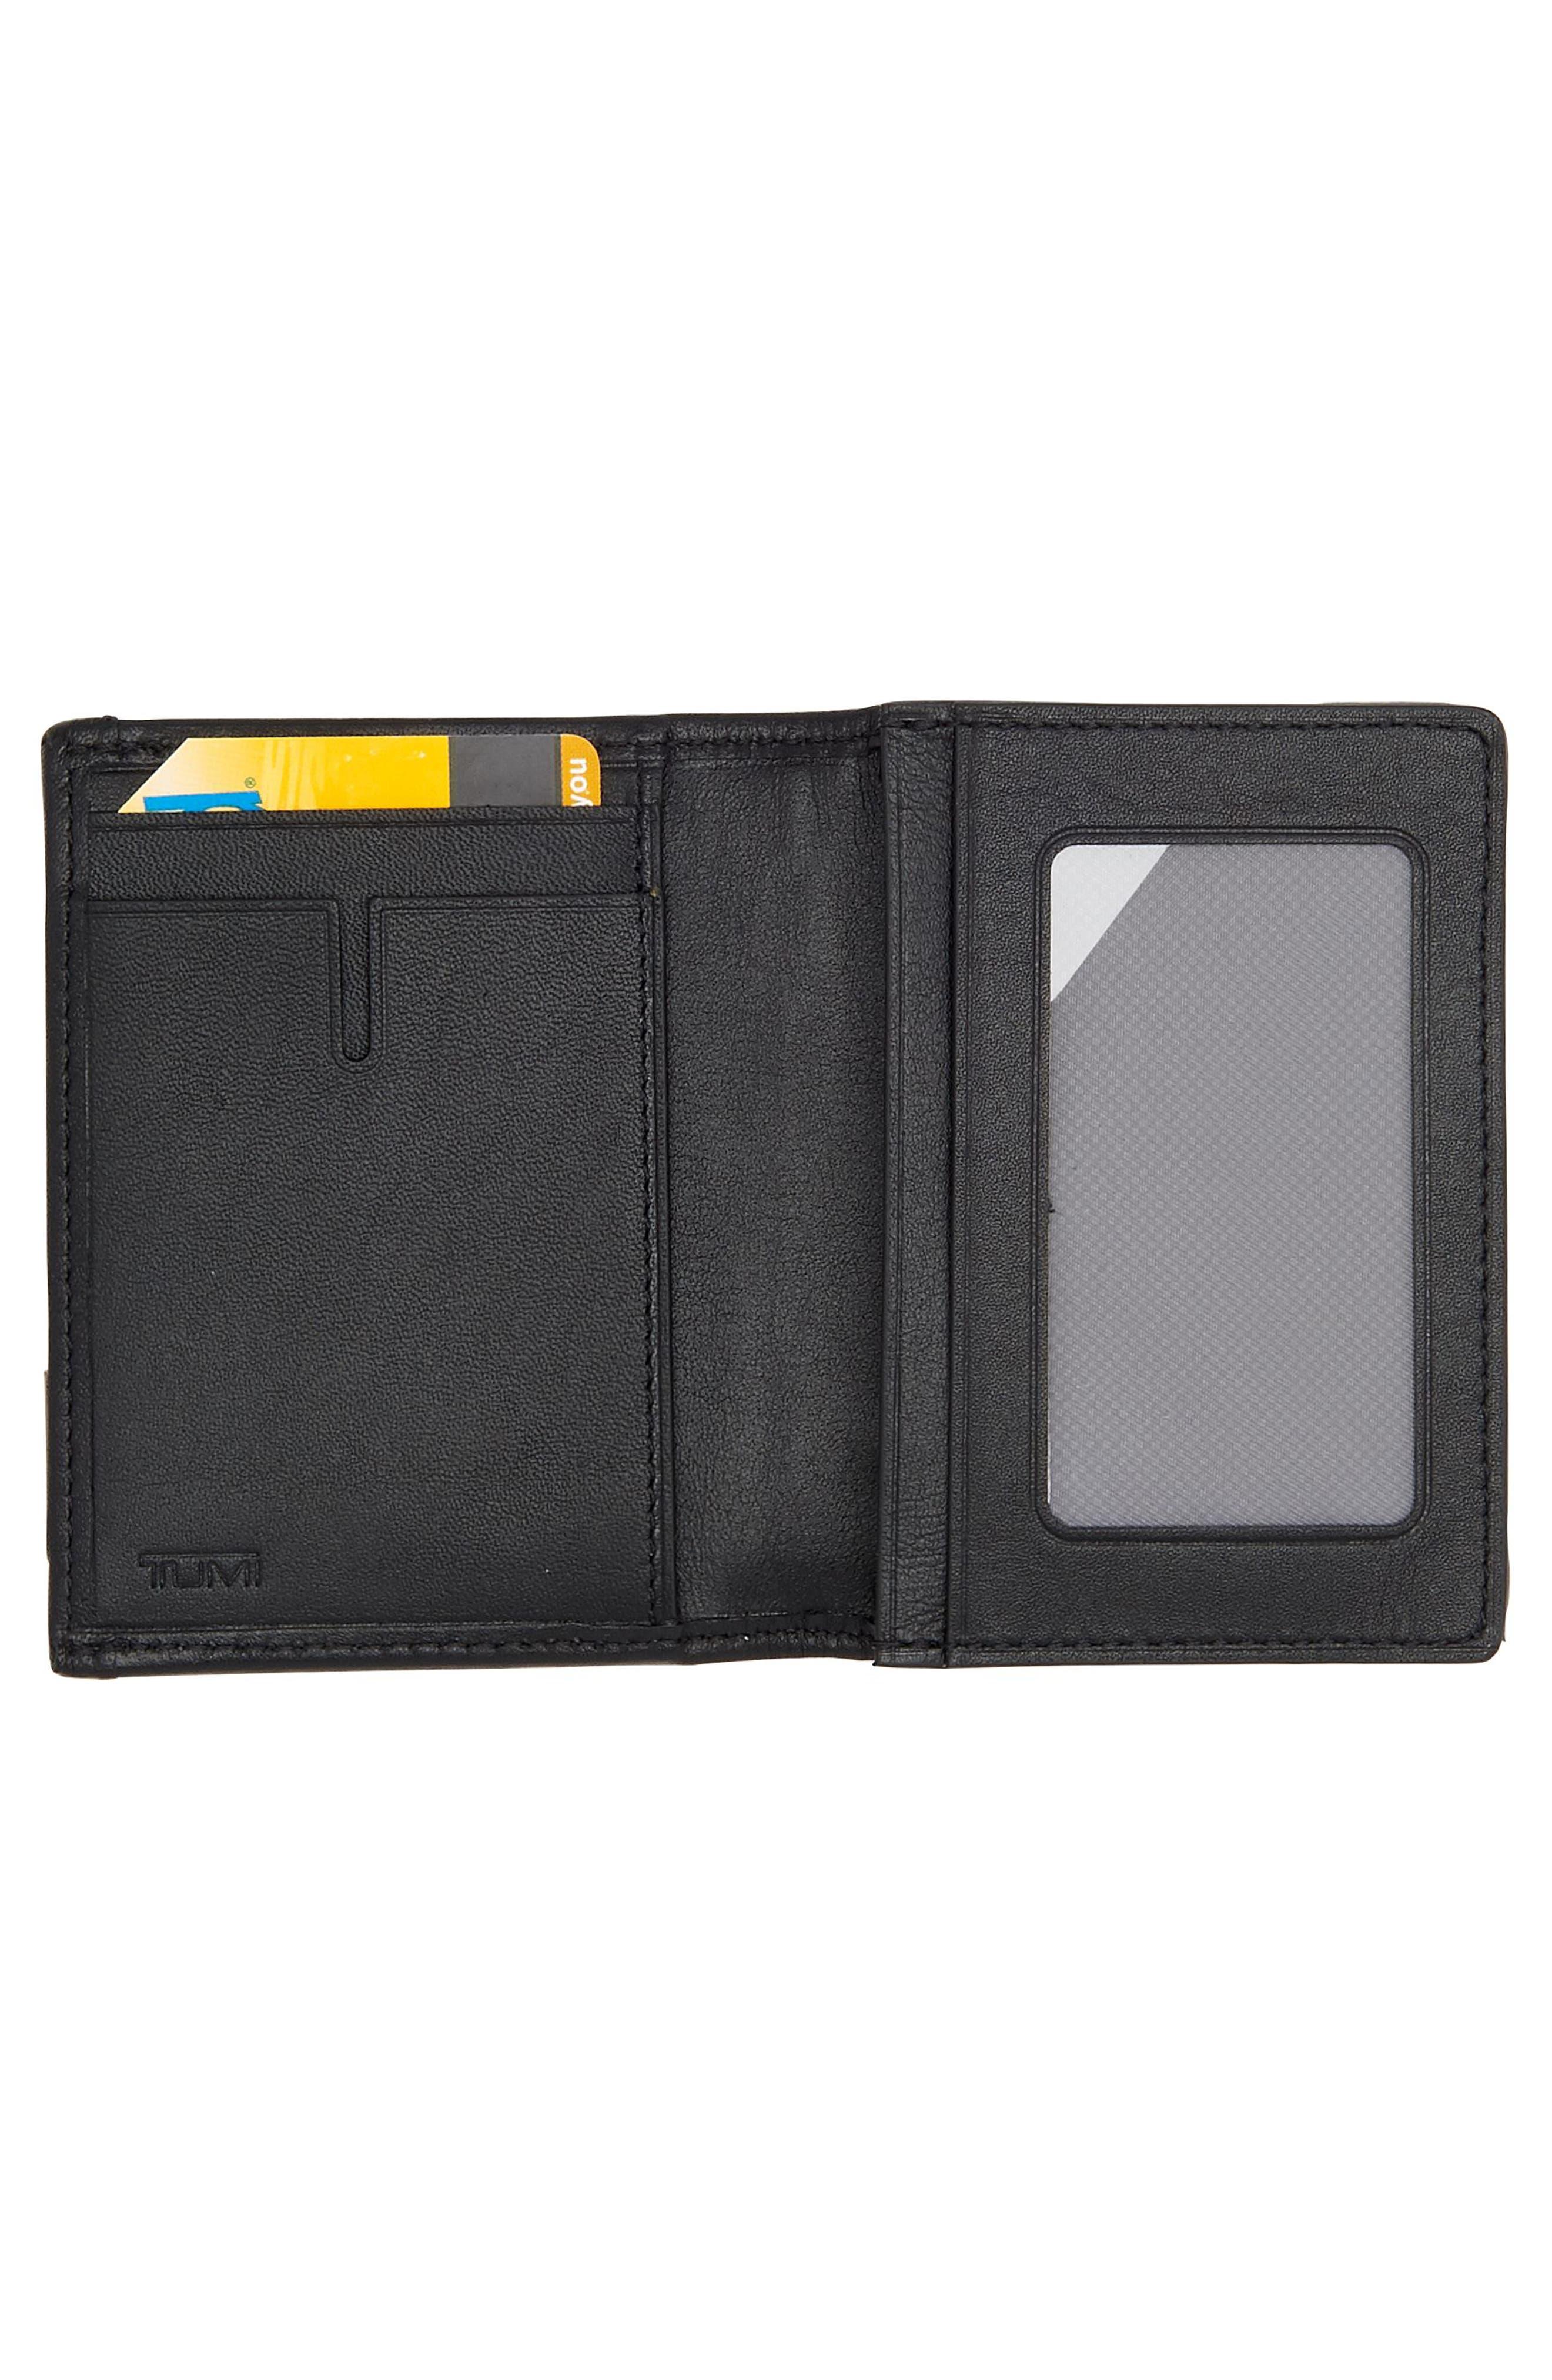 Alpha Card Case,                             Alternate thumbnail 2, color,                             020